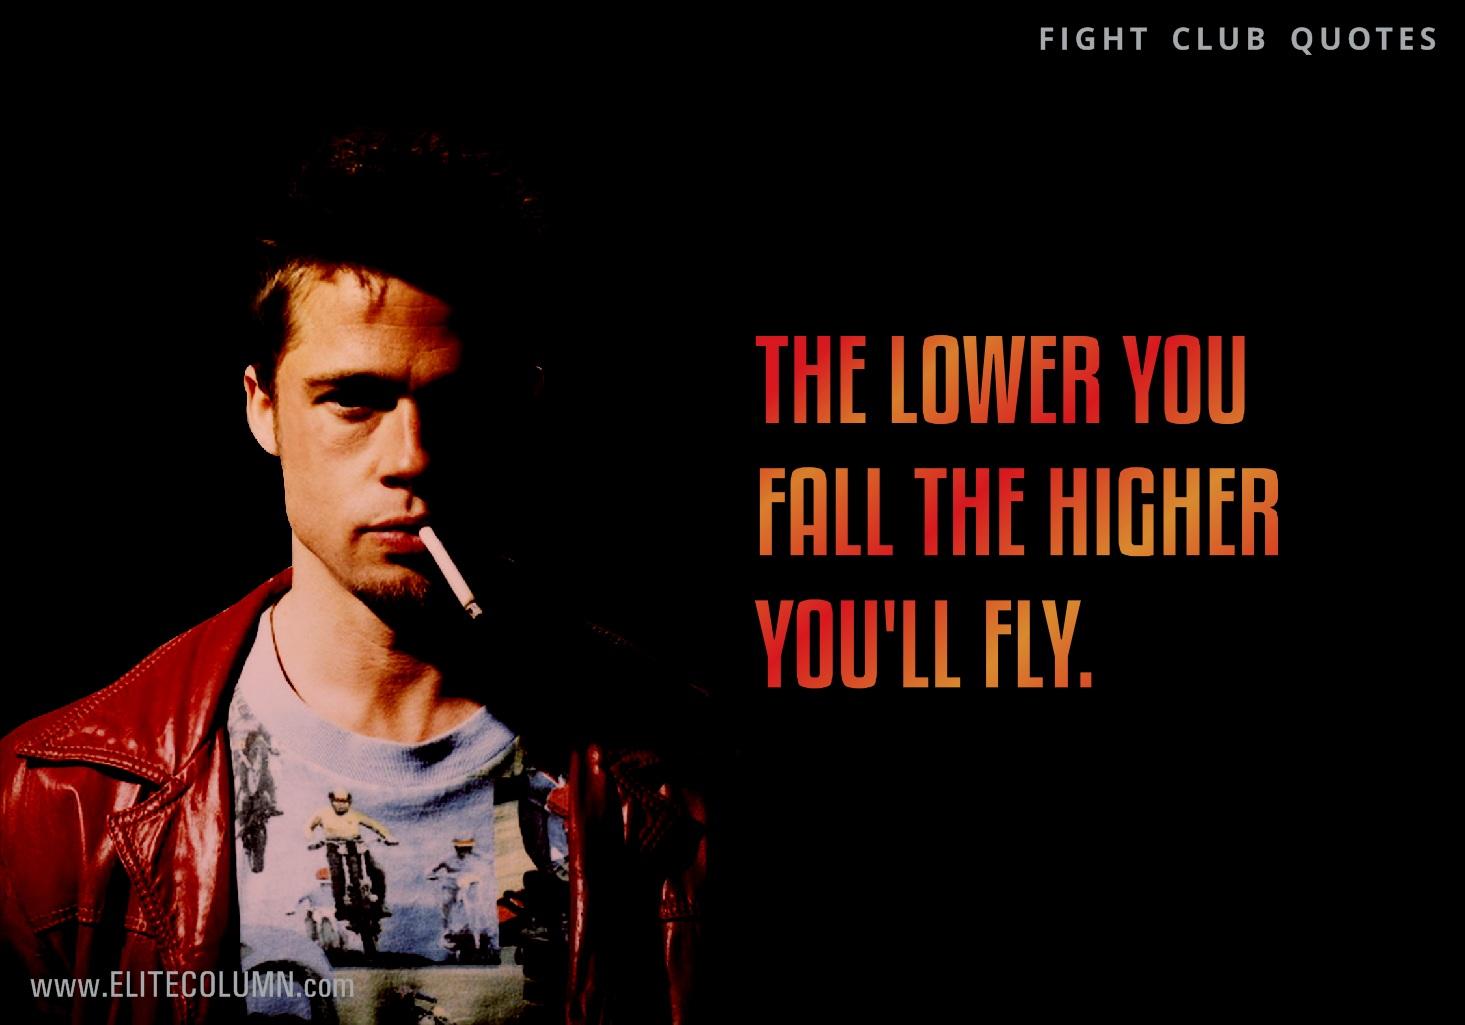 Fight Club Quotes (11)